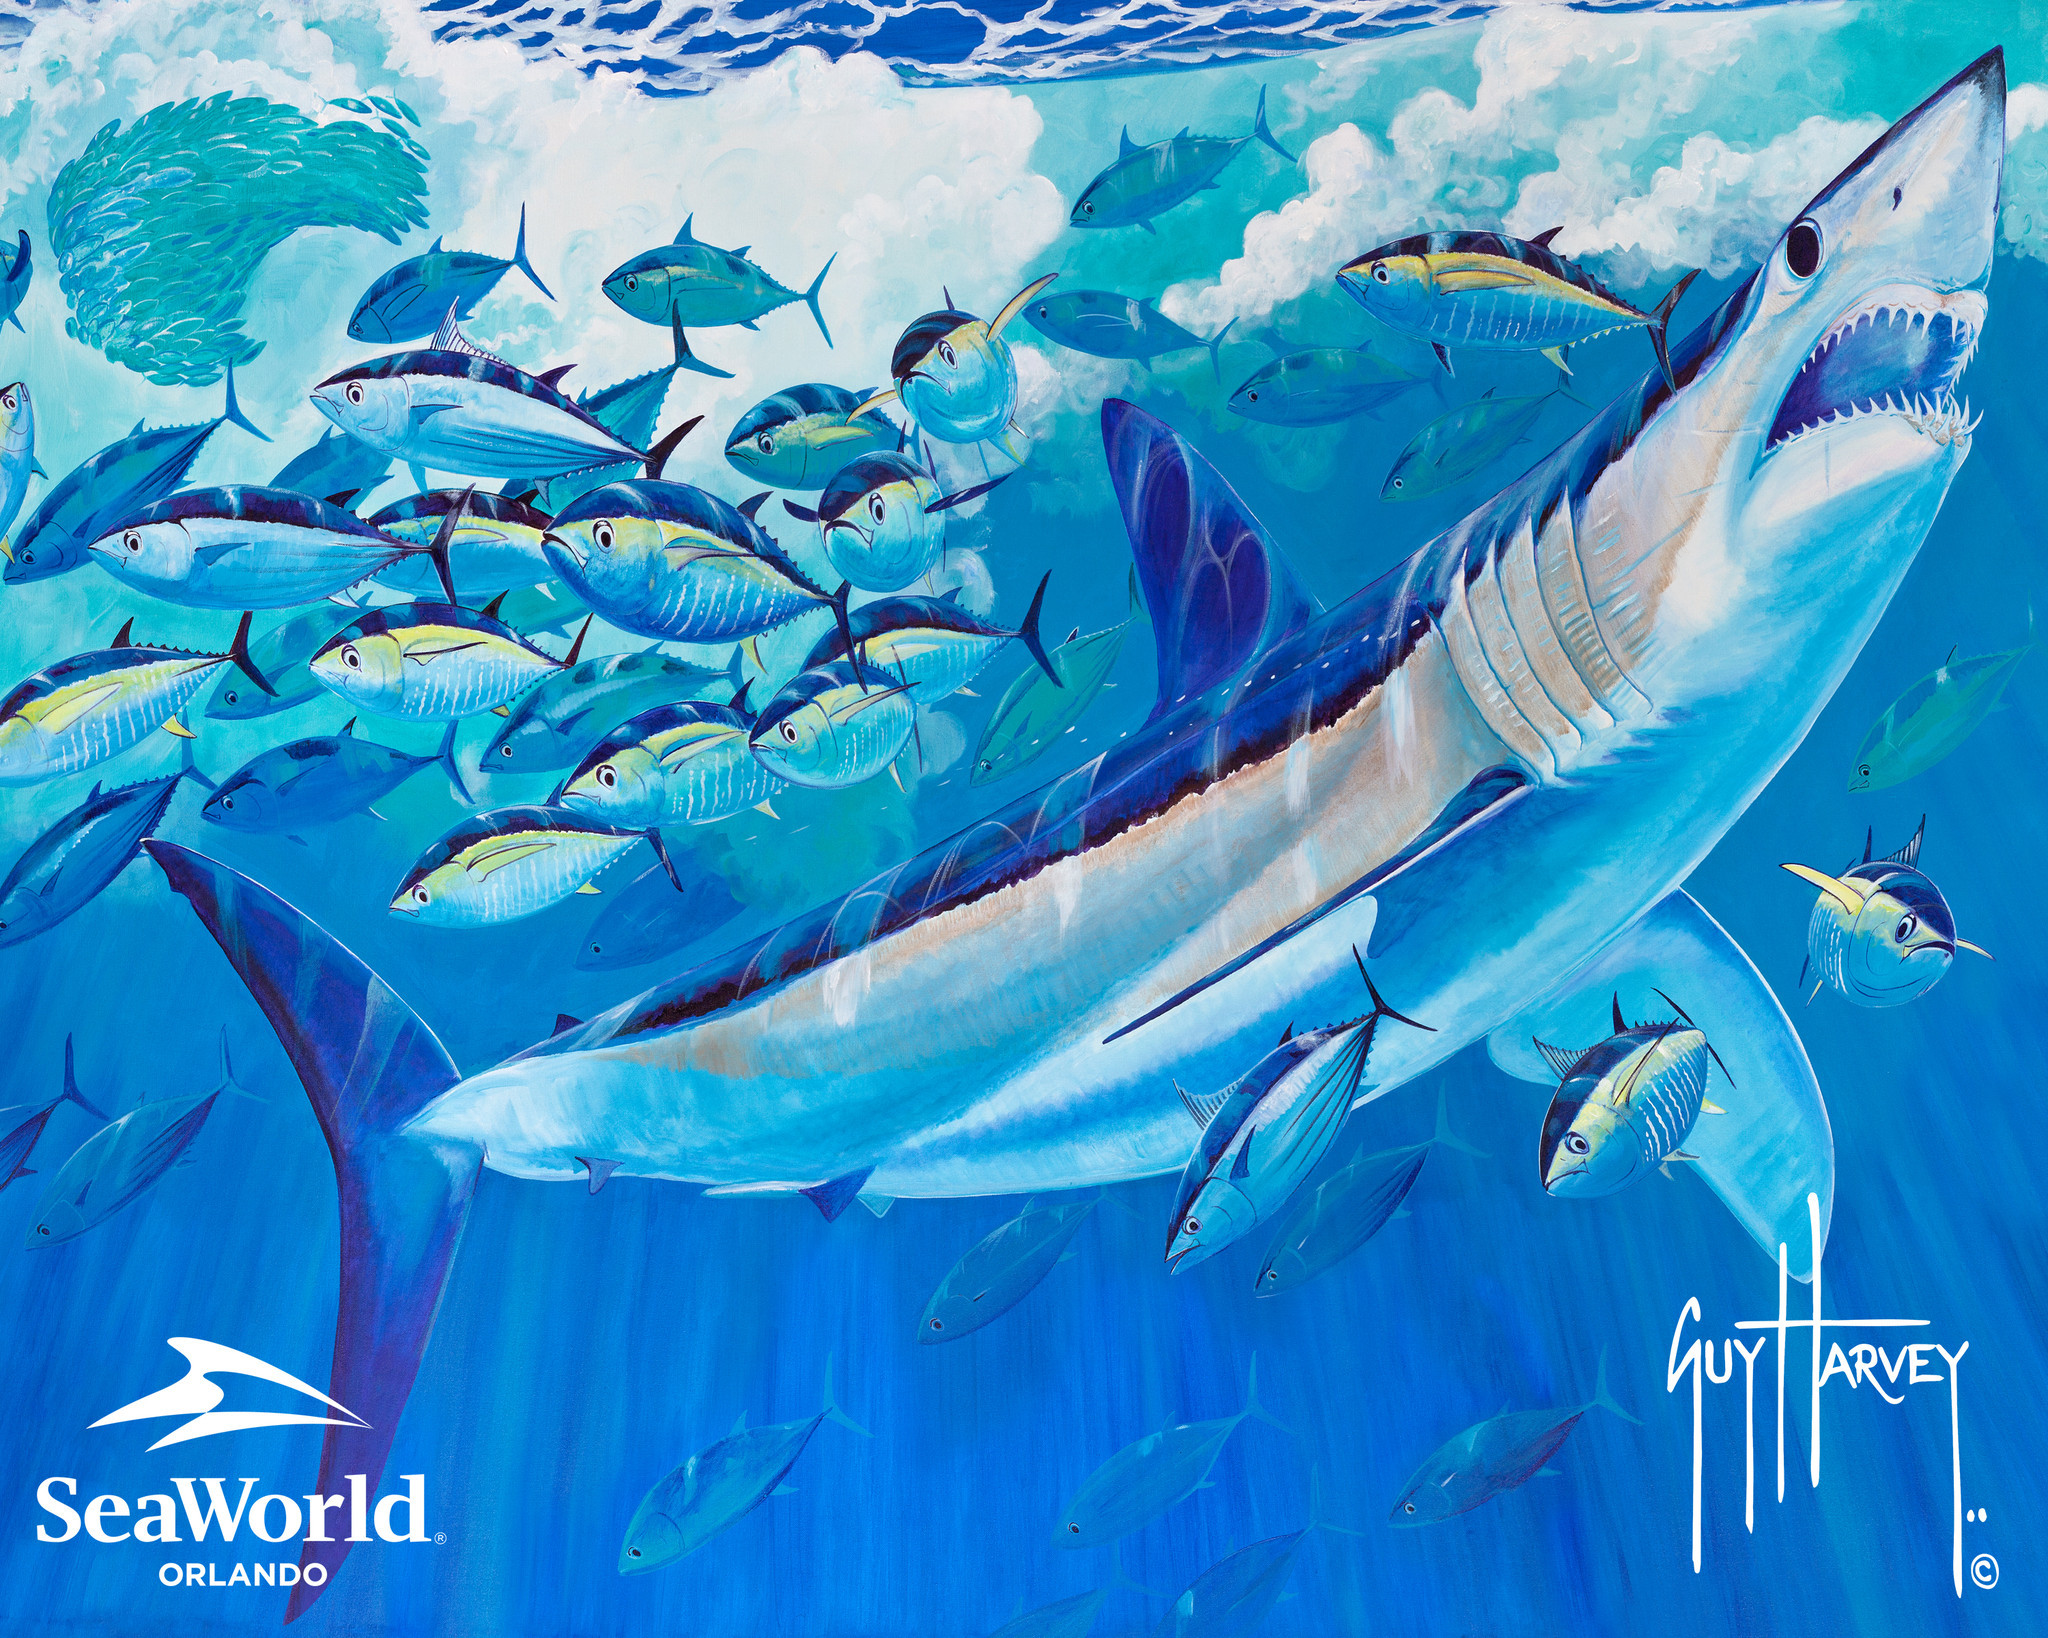 Sea world??